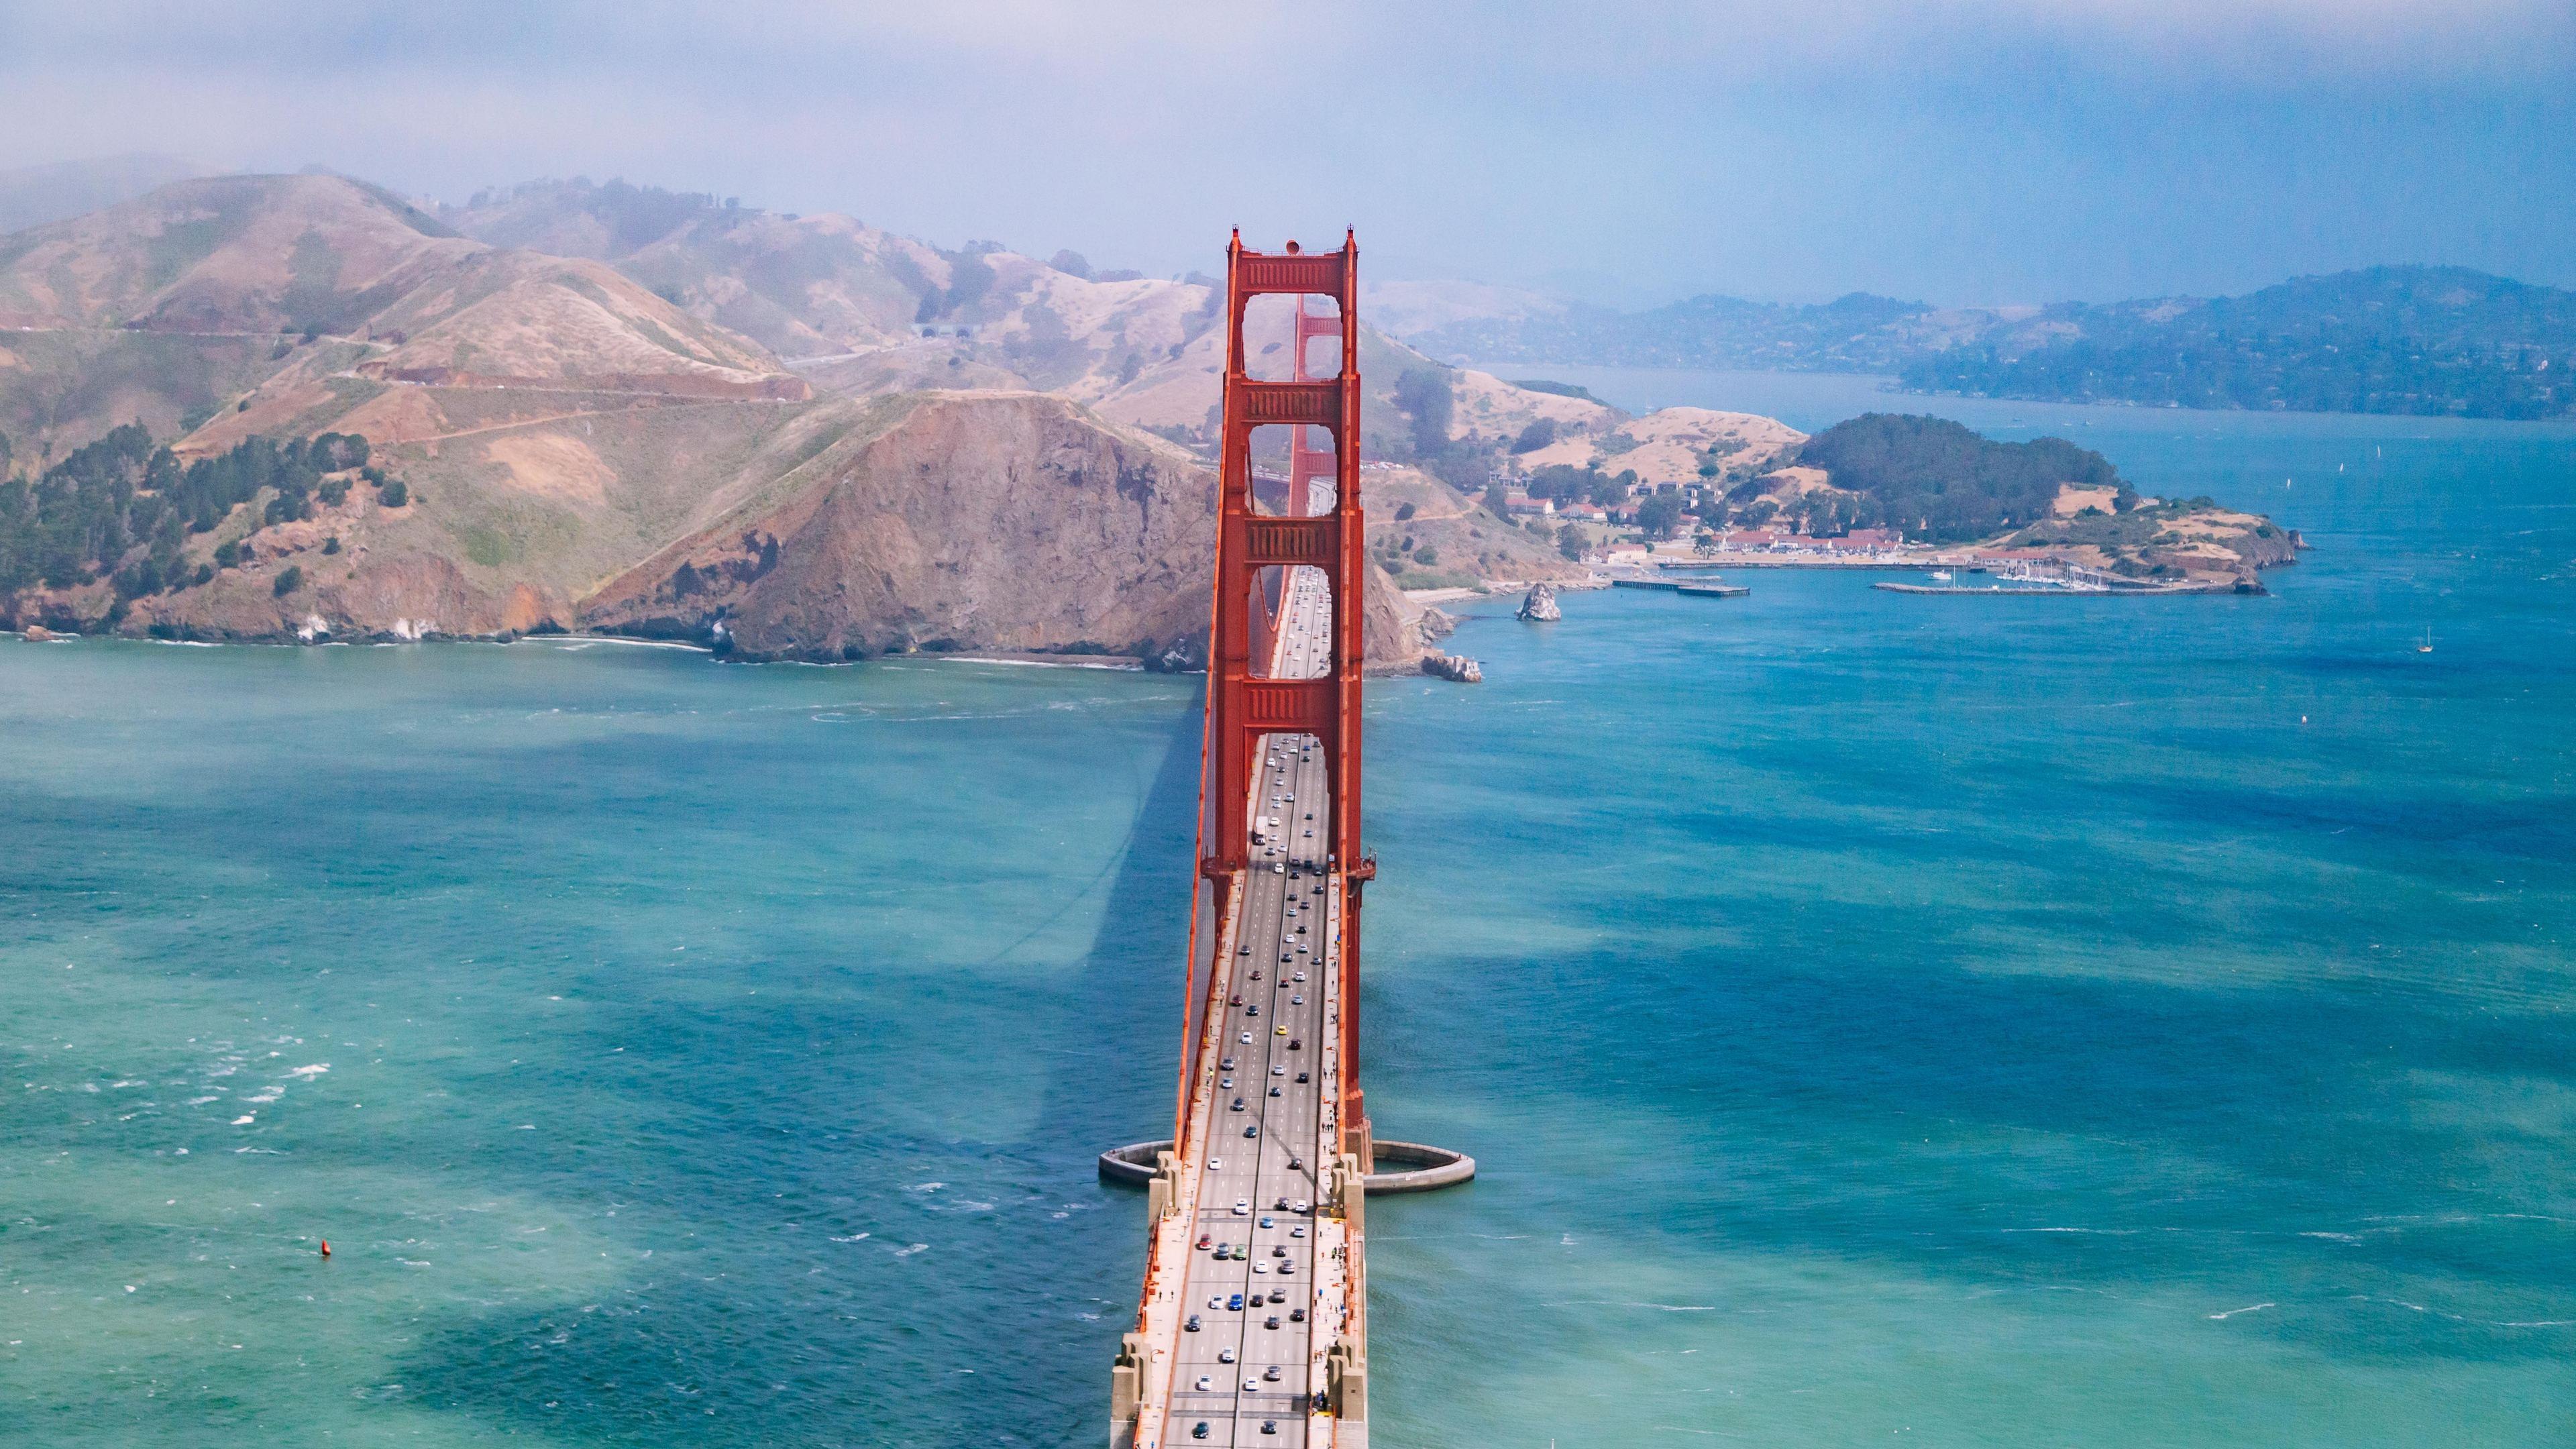 san francisco bridge aerial view 5k 1538072022 - San Francisco Bridge Aerial View 5k - world wallpapers, san franciso wallpapers, hd-wallpapers, city wallpapers, bridge wallpapers, aerial wallpapers, 5k wallpapers, 4k-wallpapers